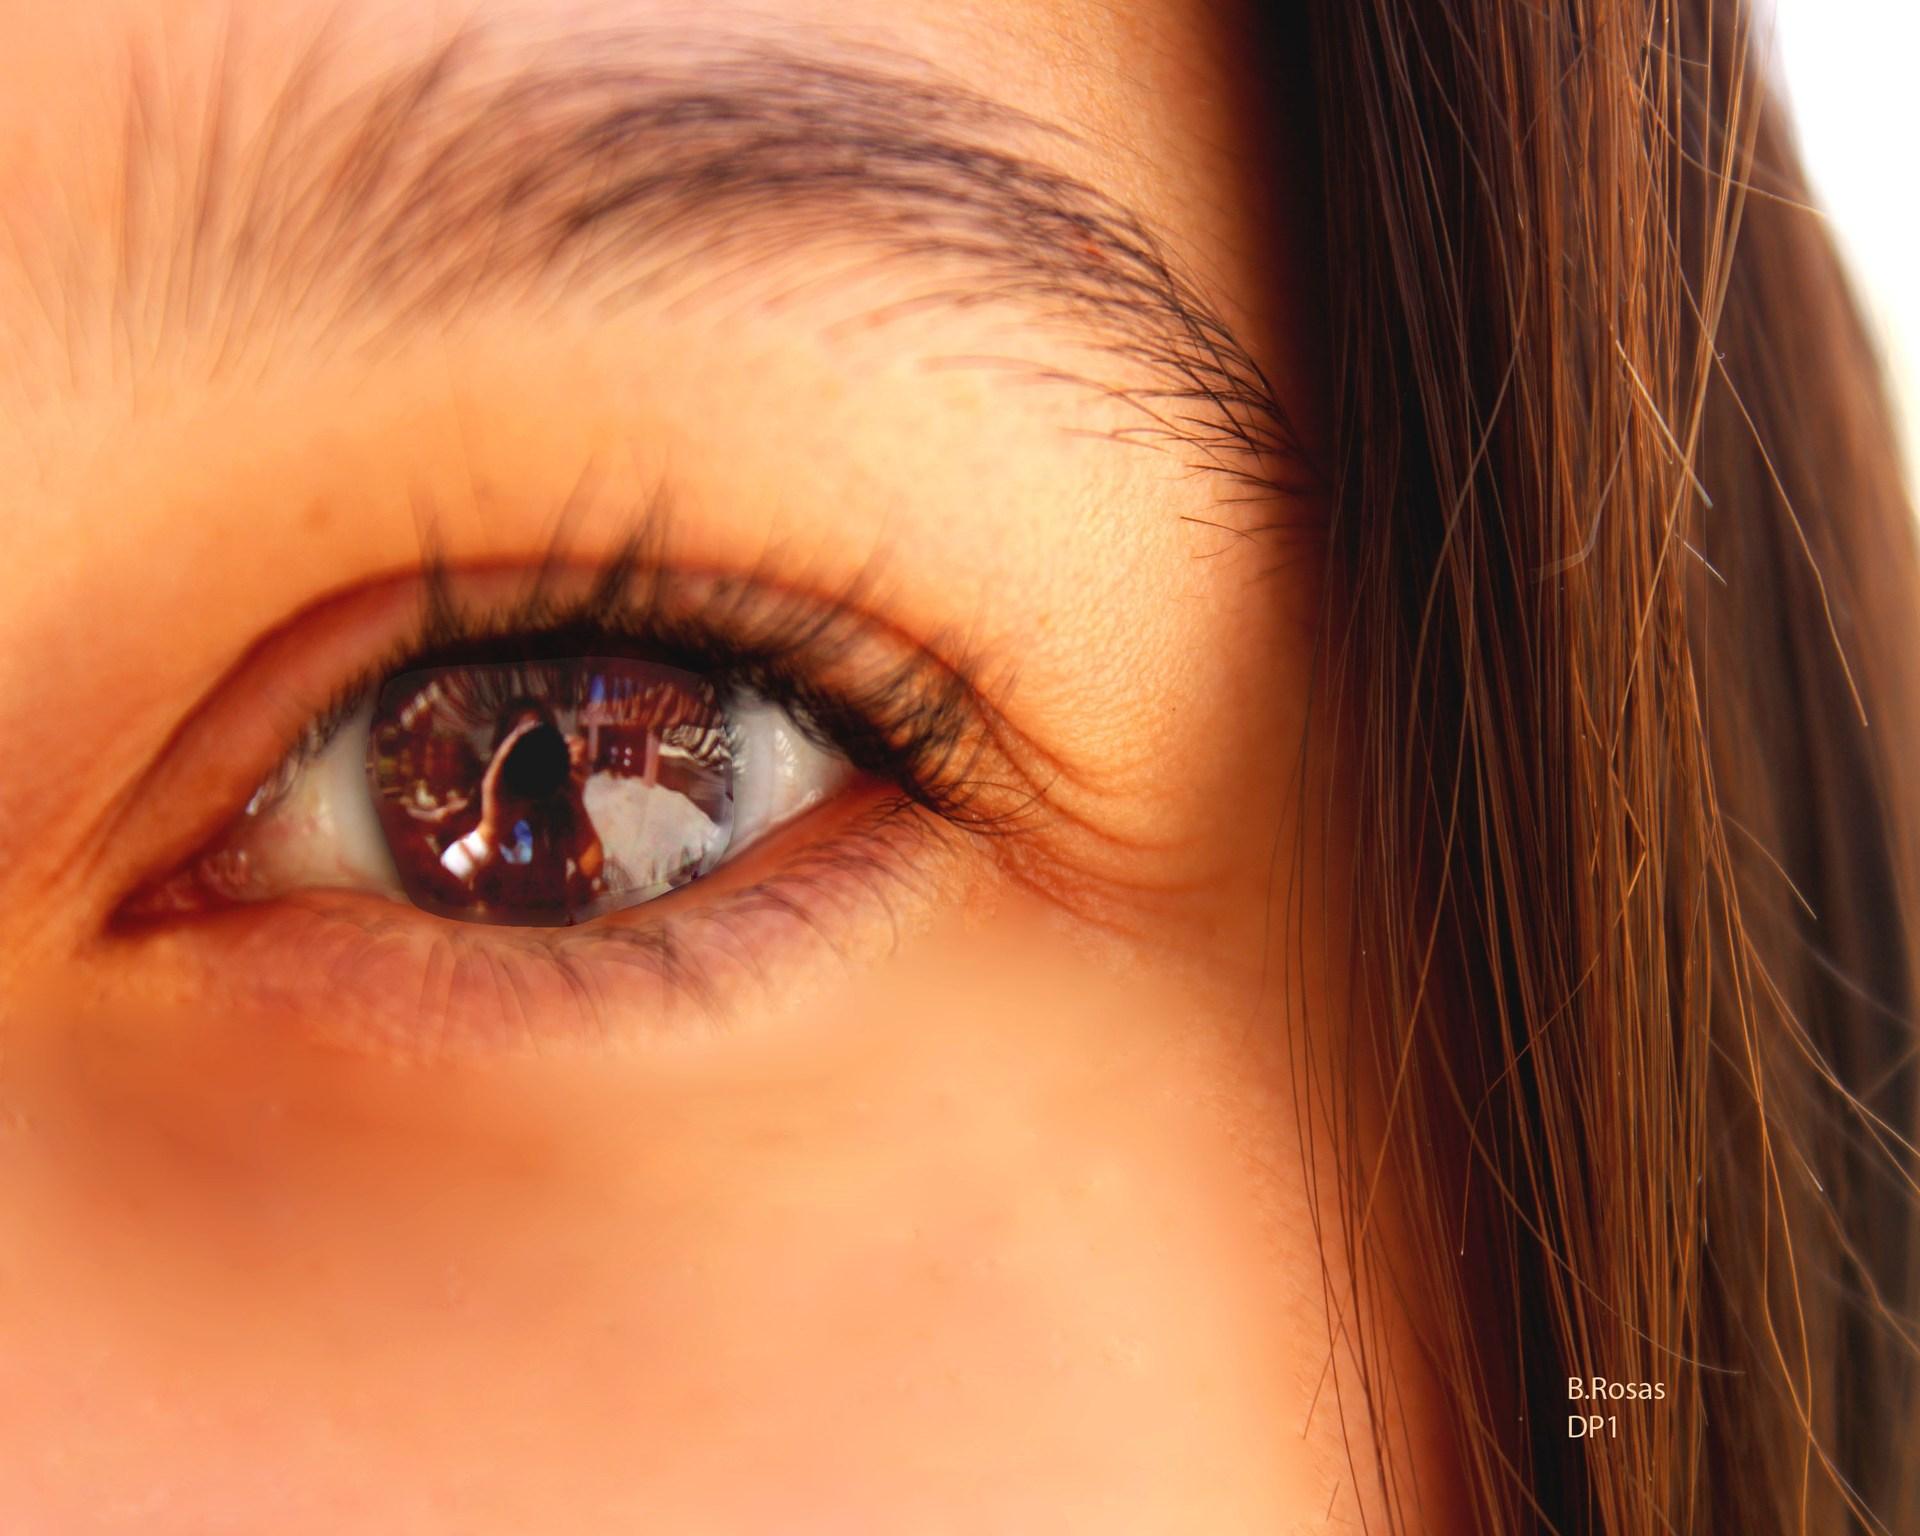 Student Photo: Eye by B. Rosas